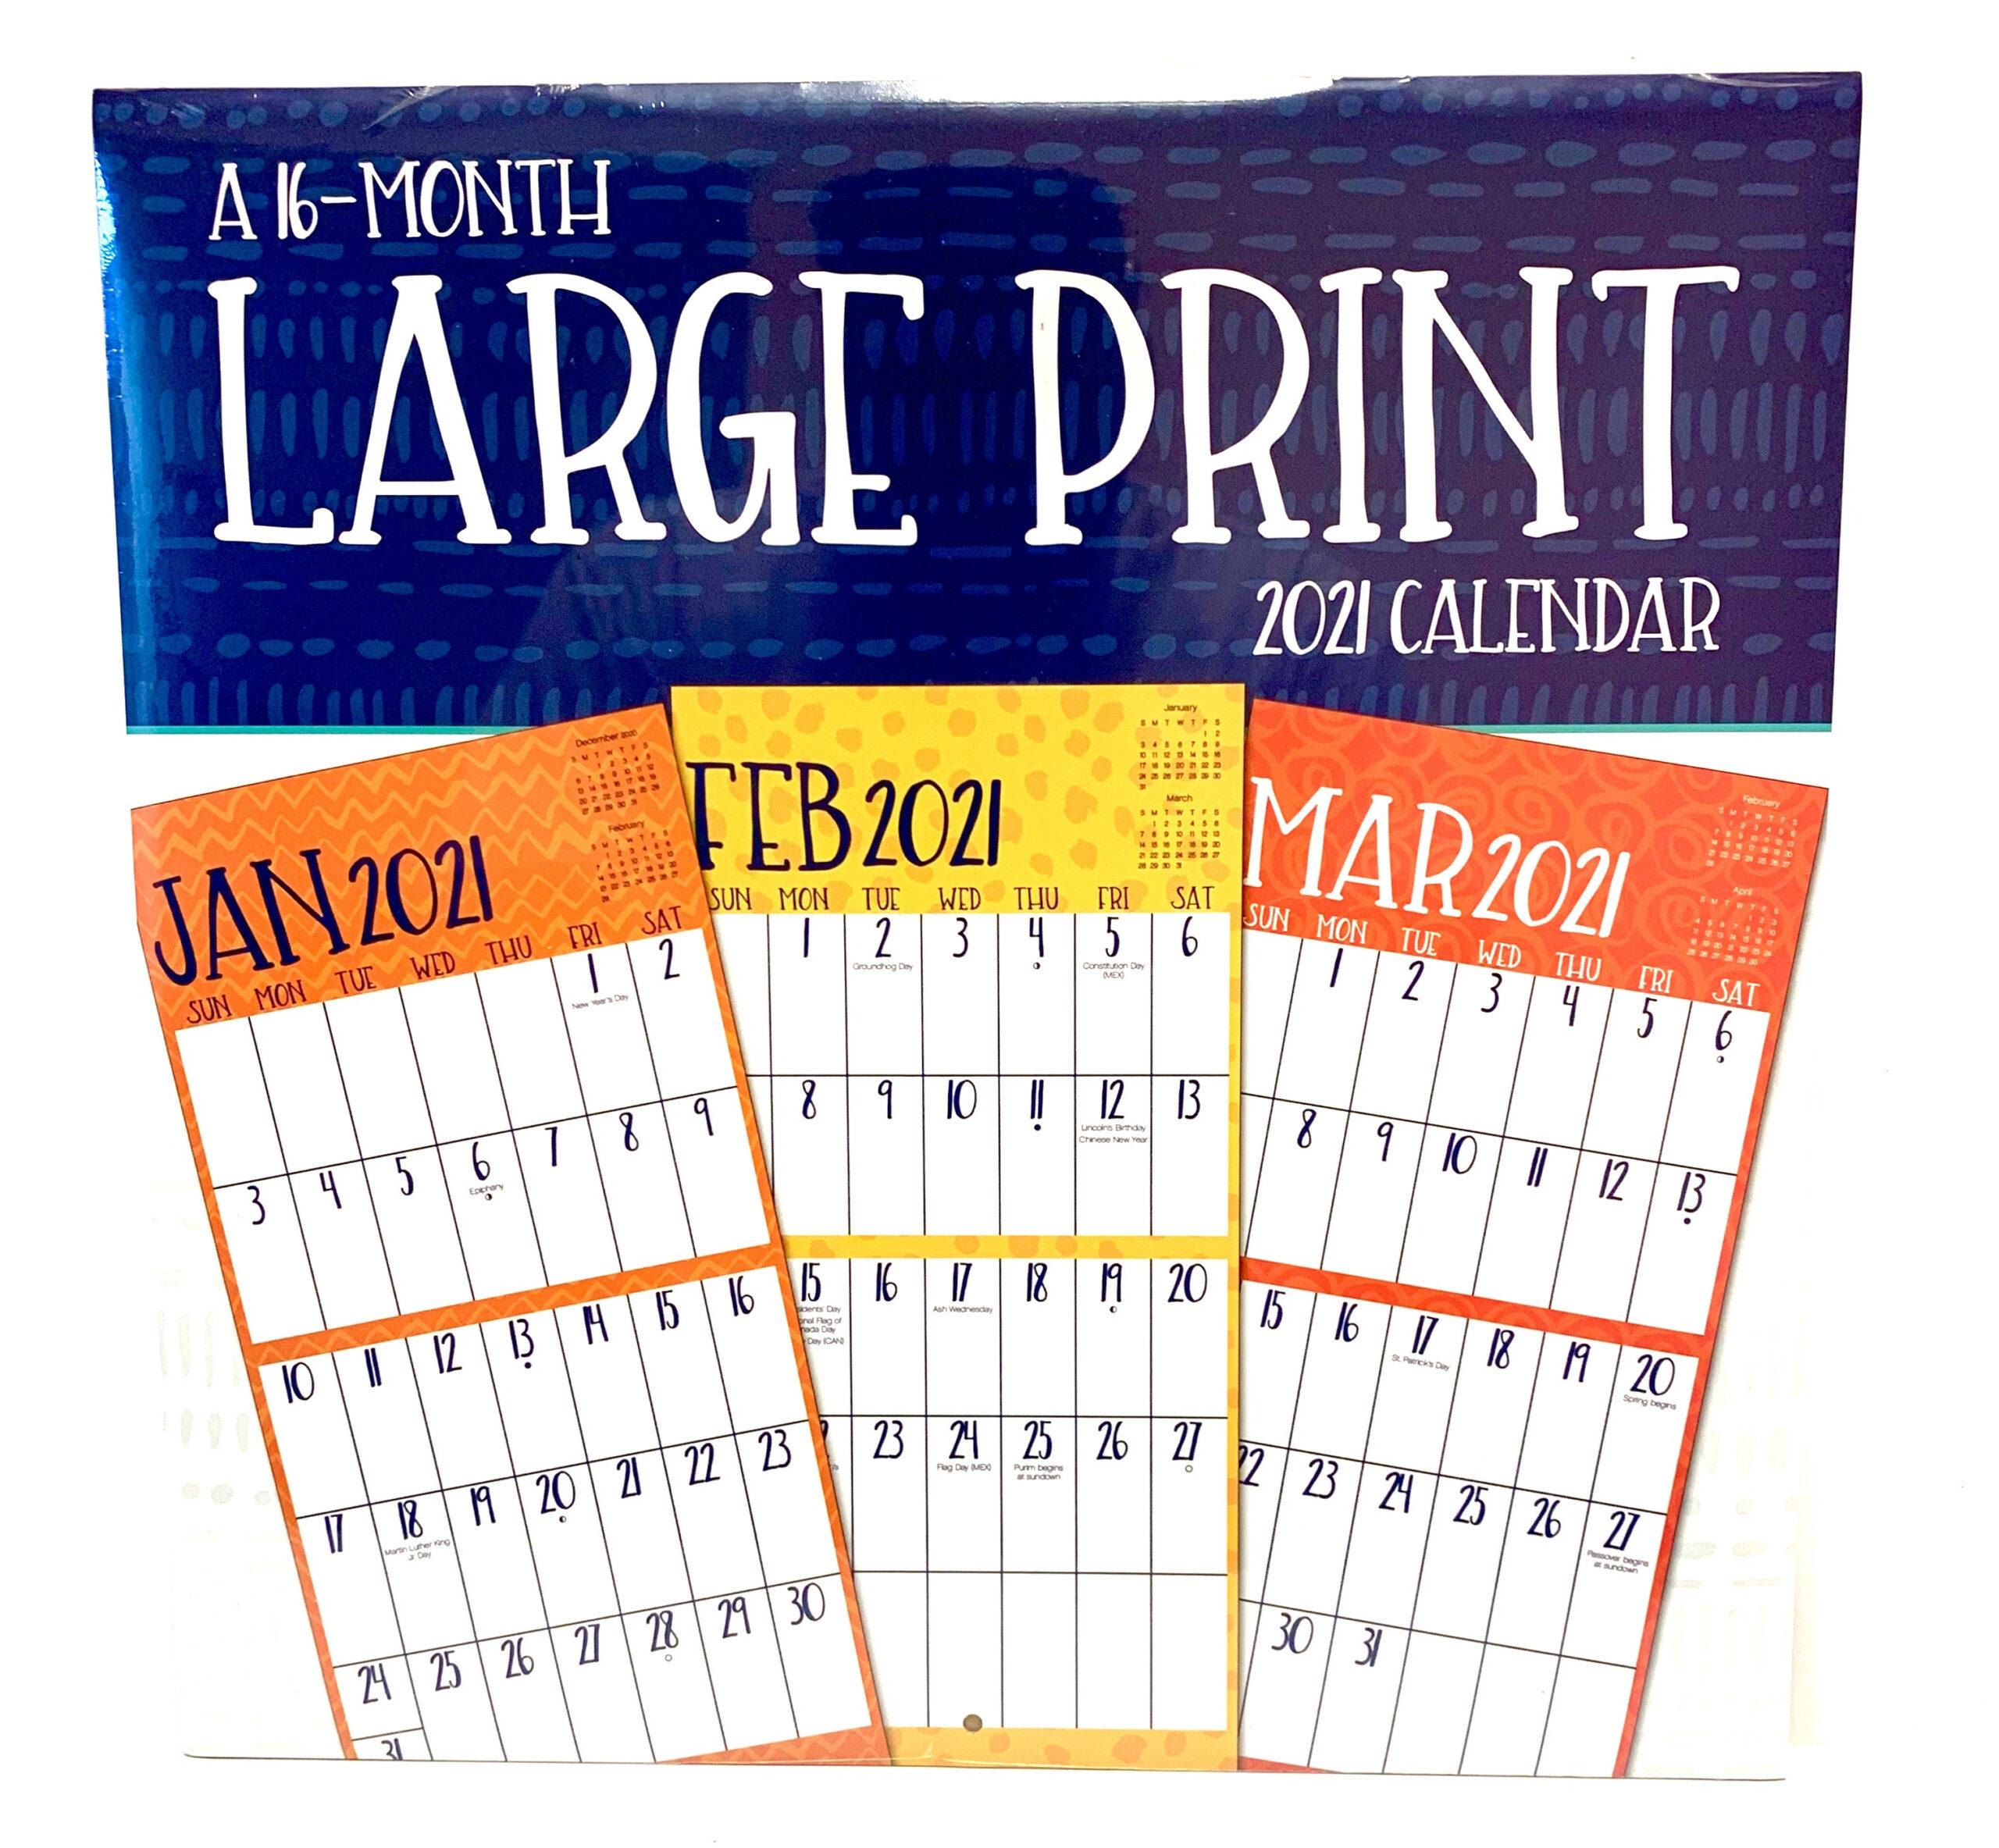 "Large Print 12"" X 24"" 16 Month 2021 Wall Calendar - Walmart for 2021 Large Print Calendar Monthly"